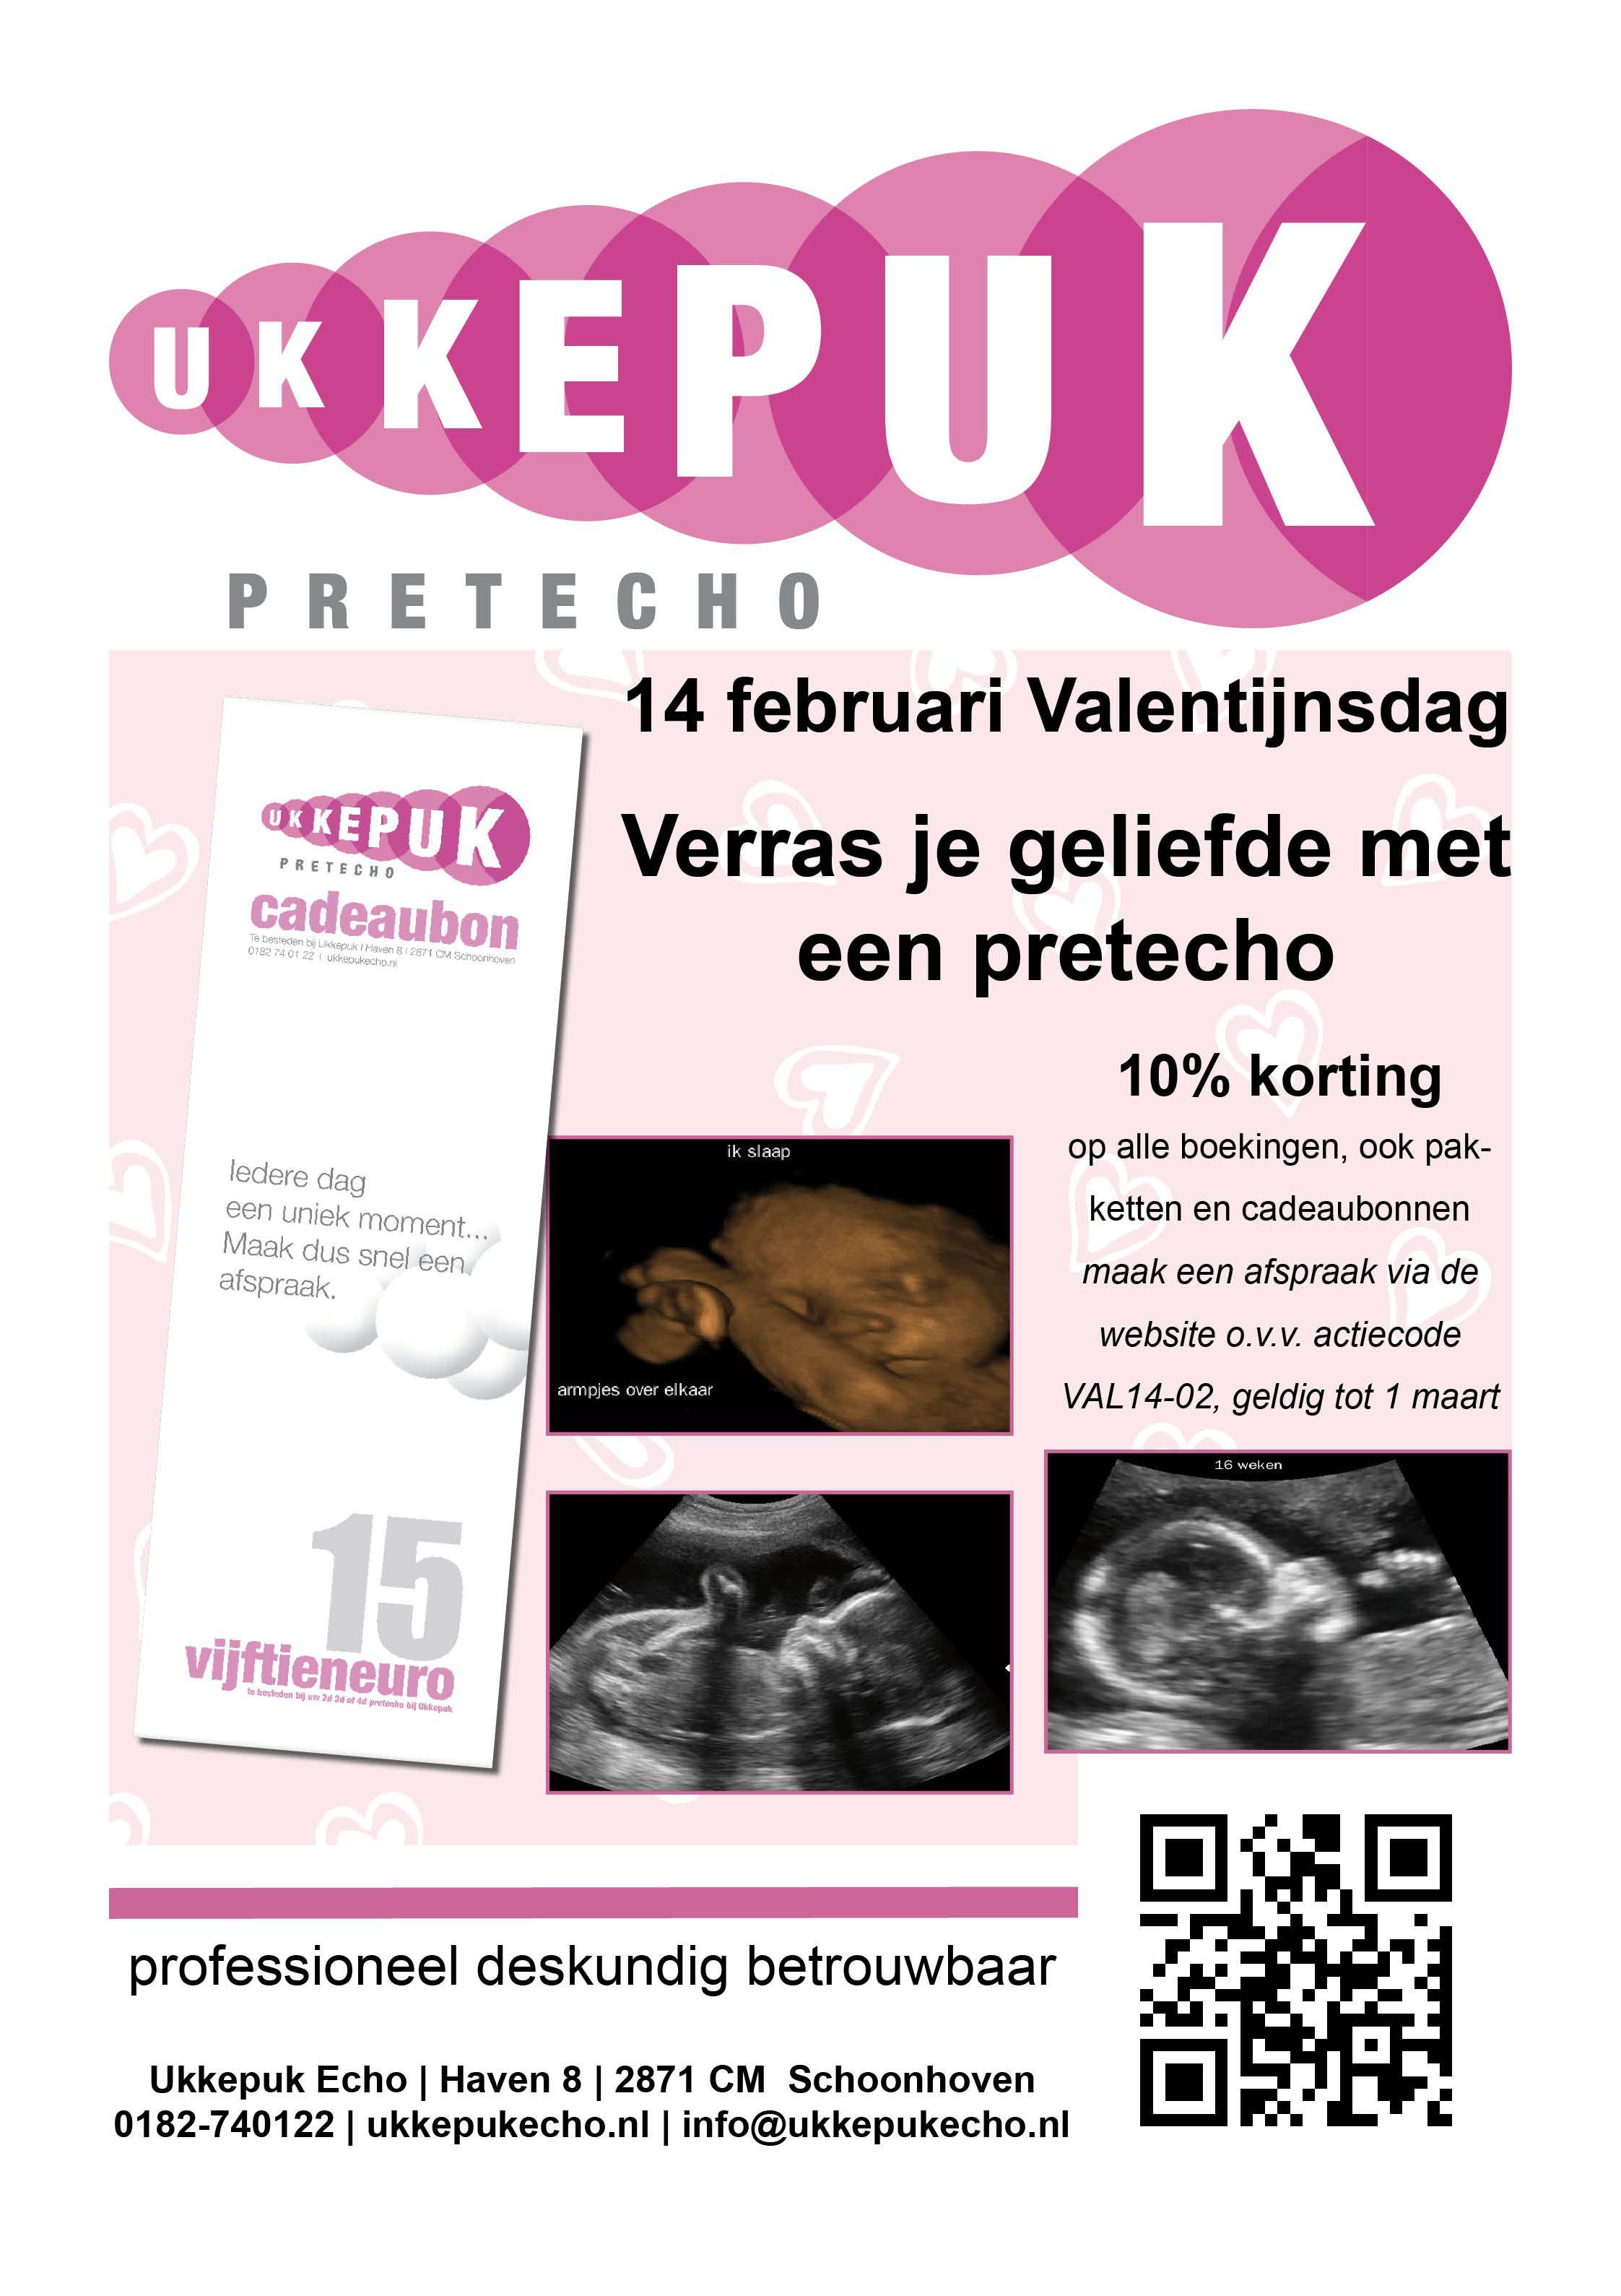 Stoepbord Ukkepuk Echo, Schoonhoven   Valentijnsdag, februari 2015